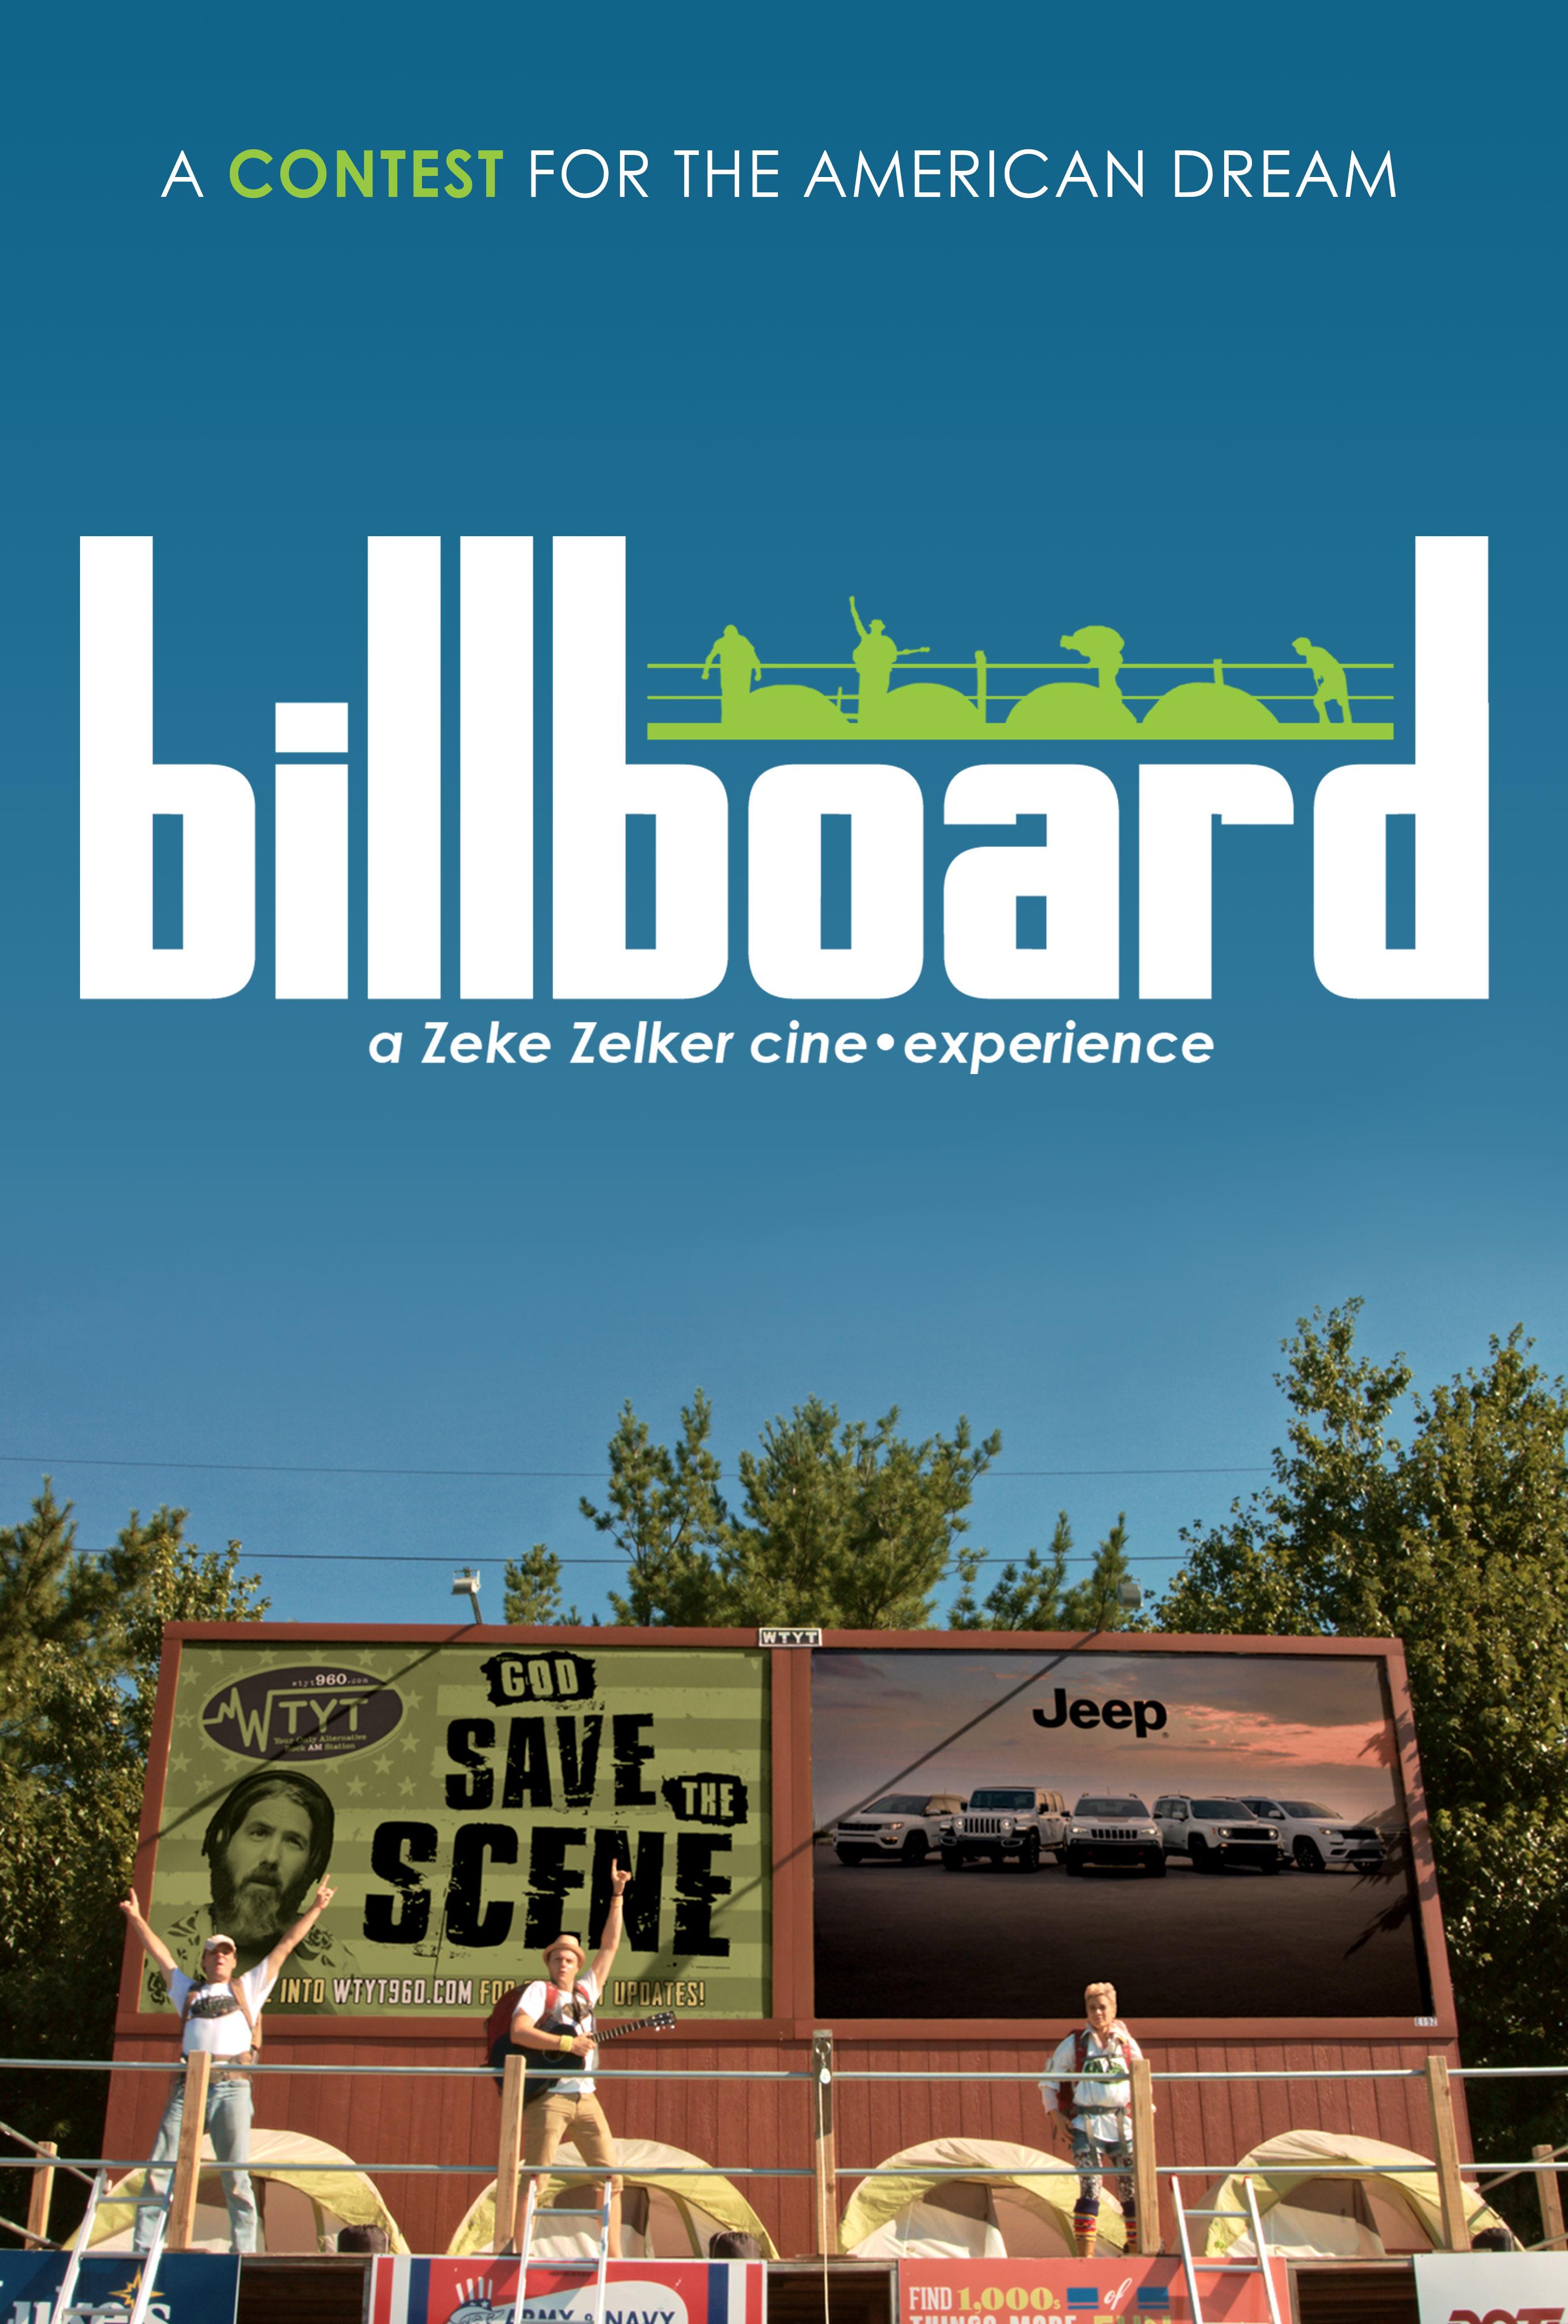 Billboard 2019 Imdb